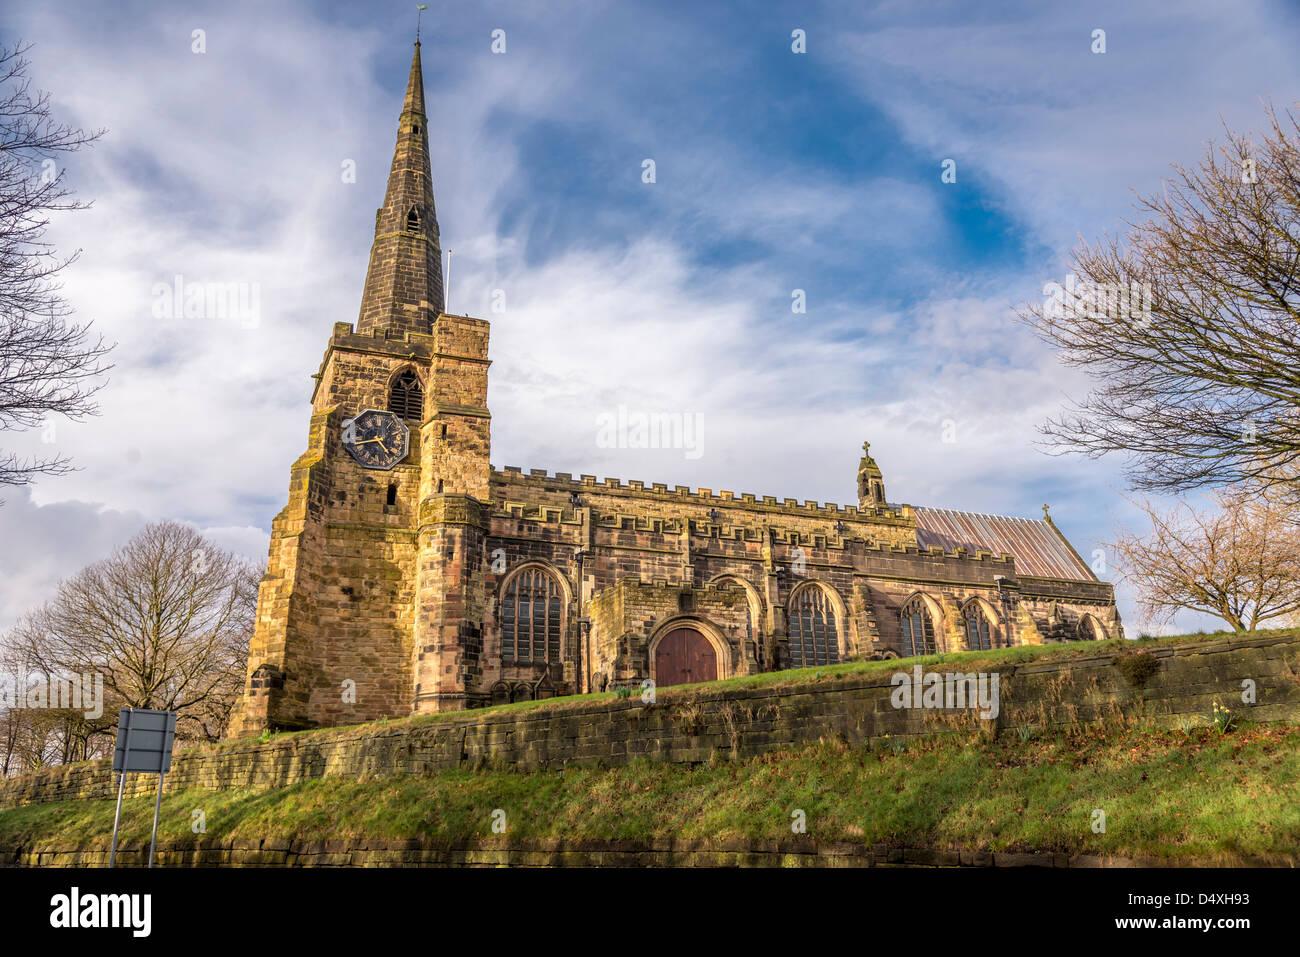 The parish church of St. Oswald's in Winwick Cheshire. - Stock Image